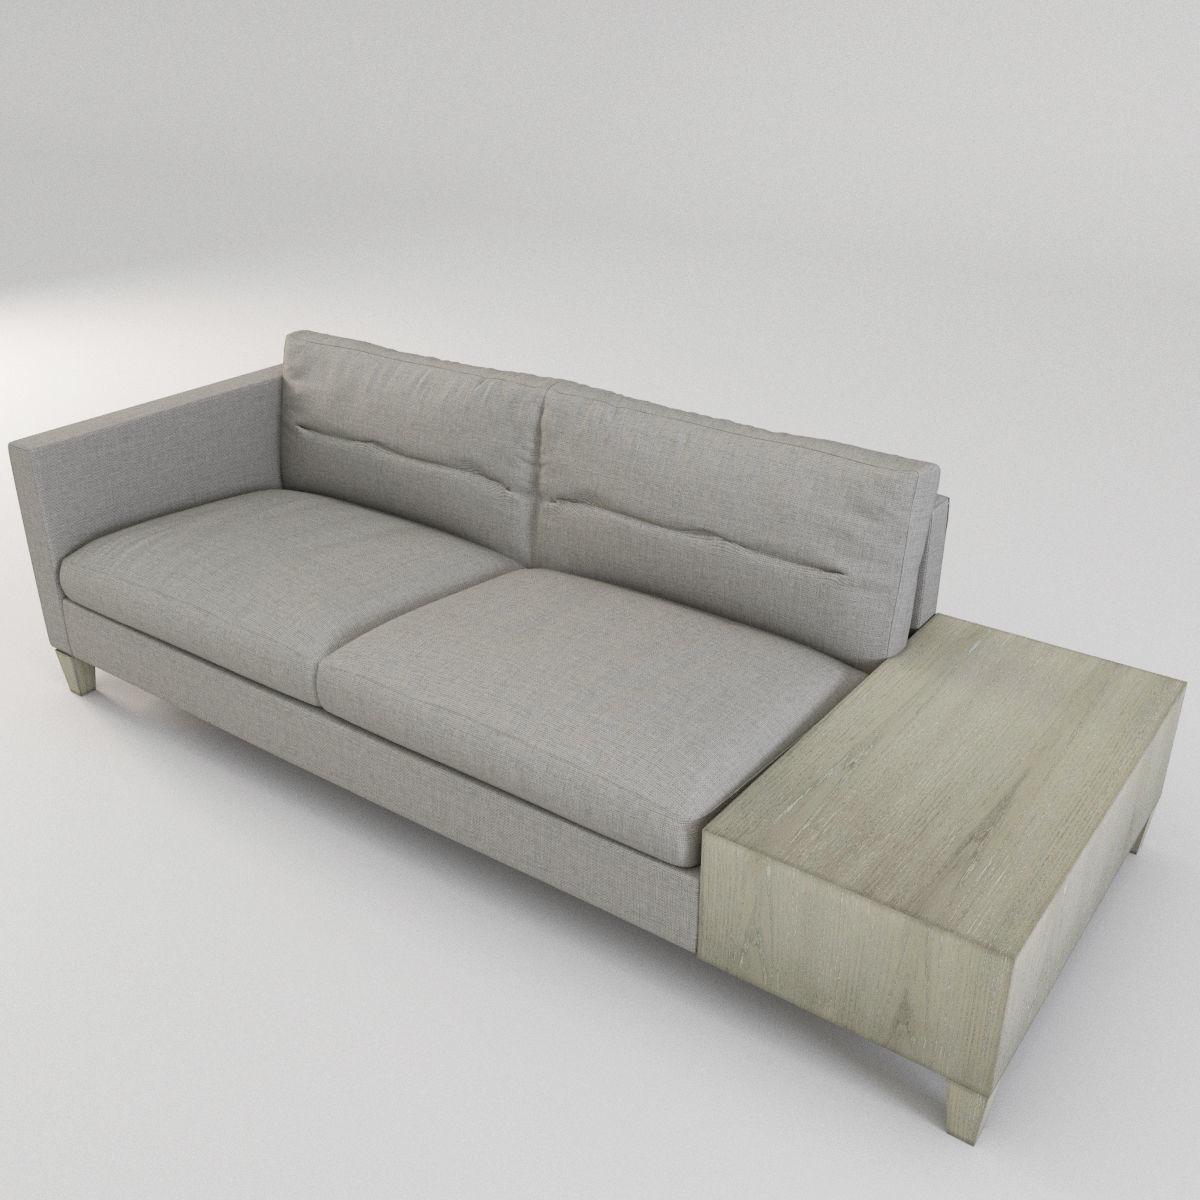 Bernhardt Sovrano Left Arm Sofa Seating